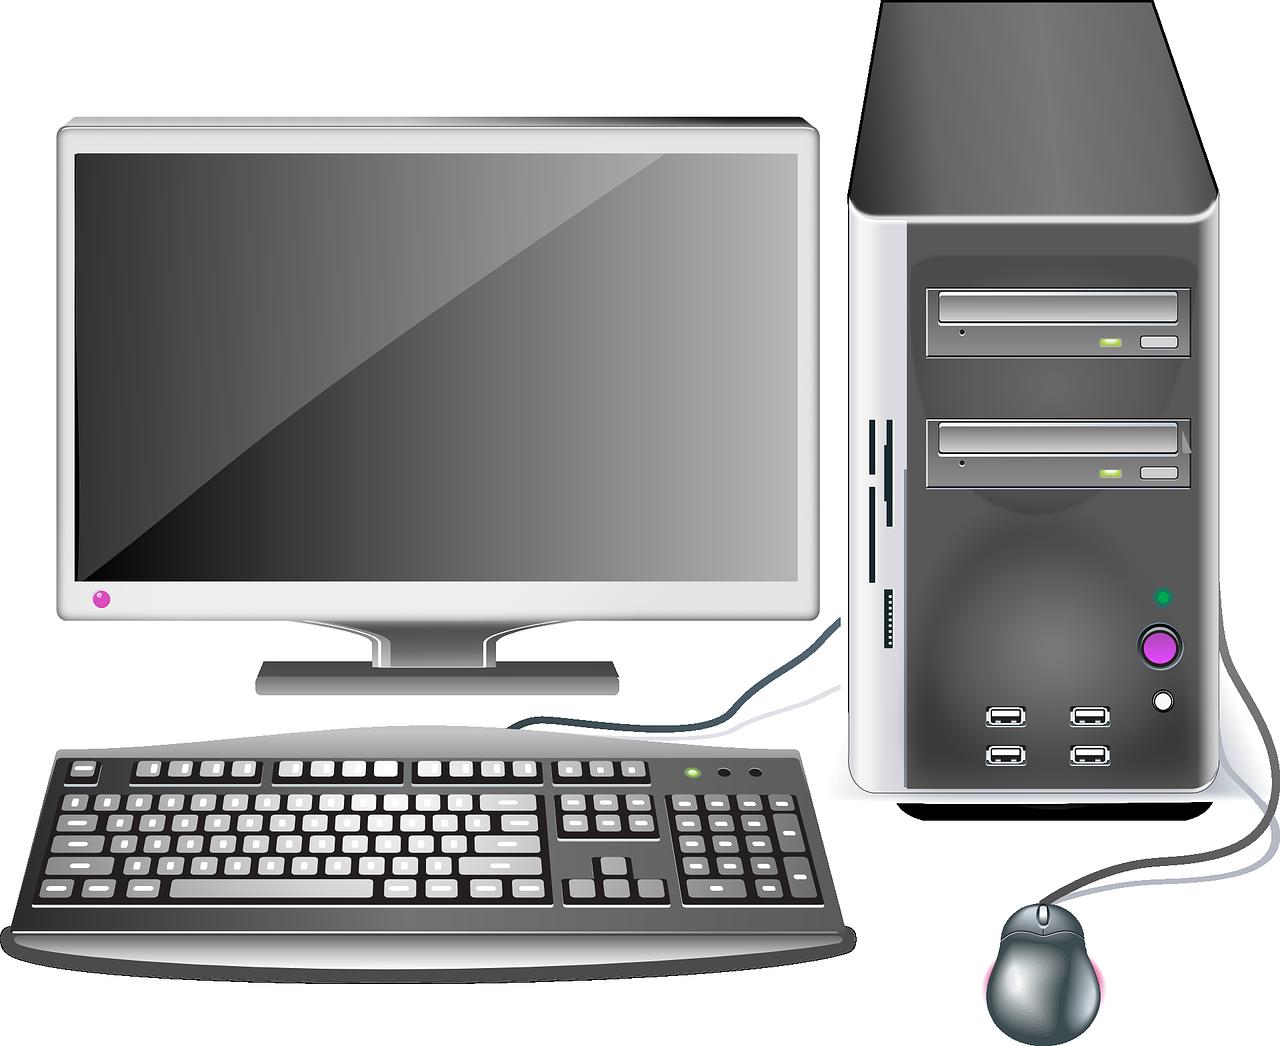 PC als Server